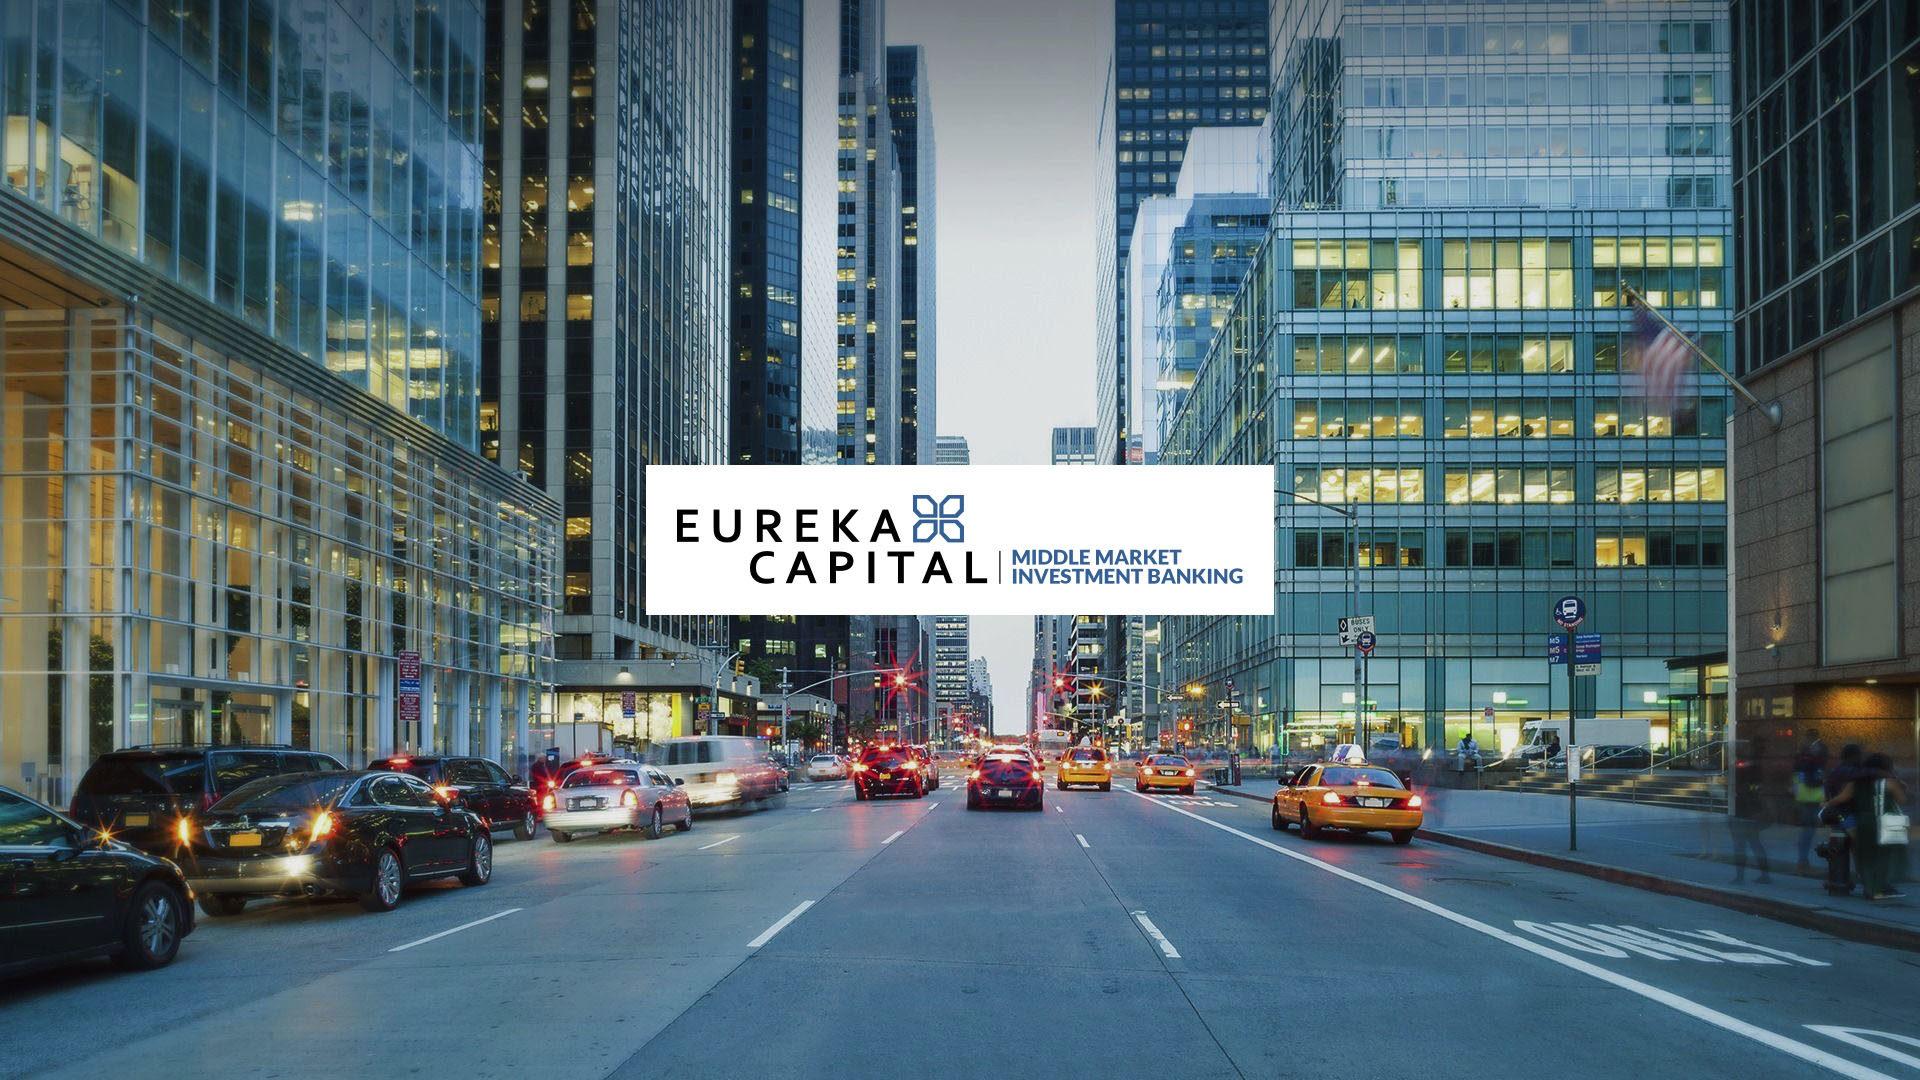 Eureka Website Design and Development